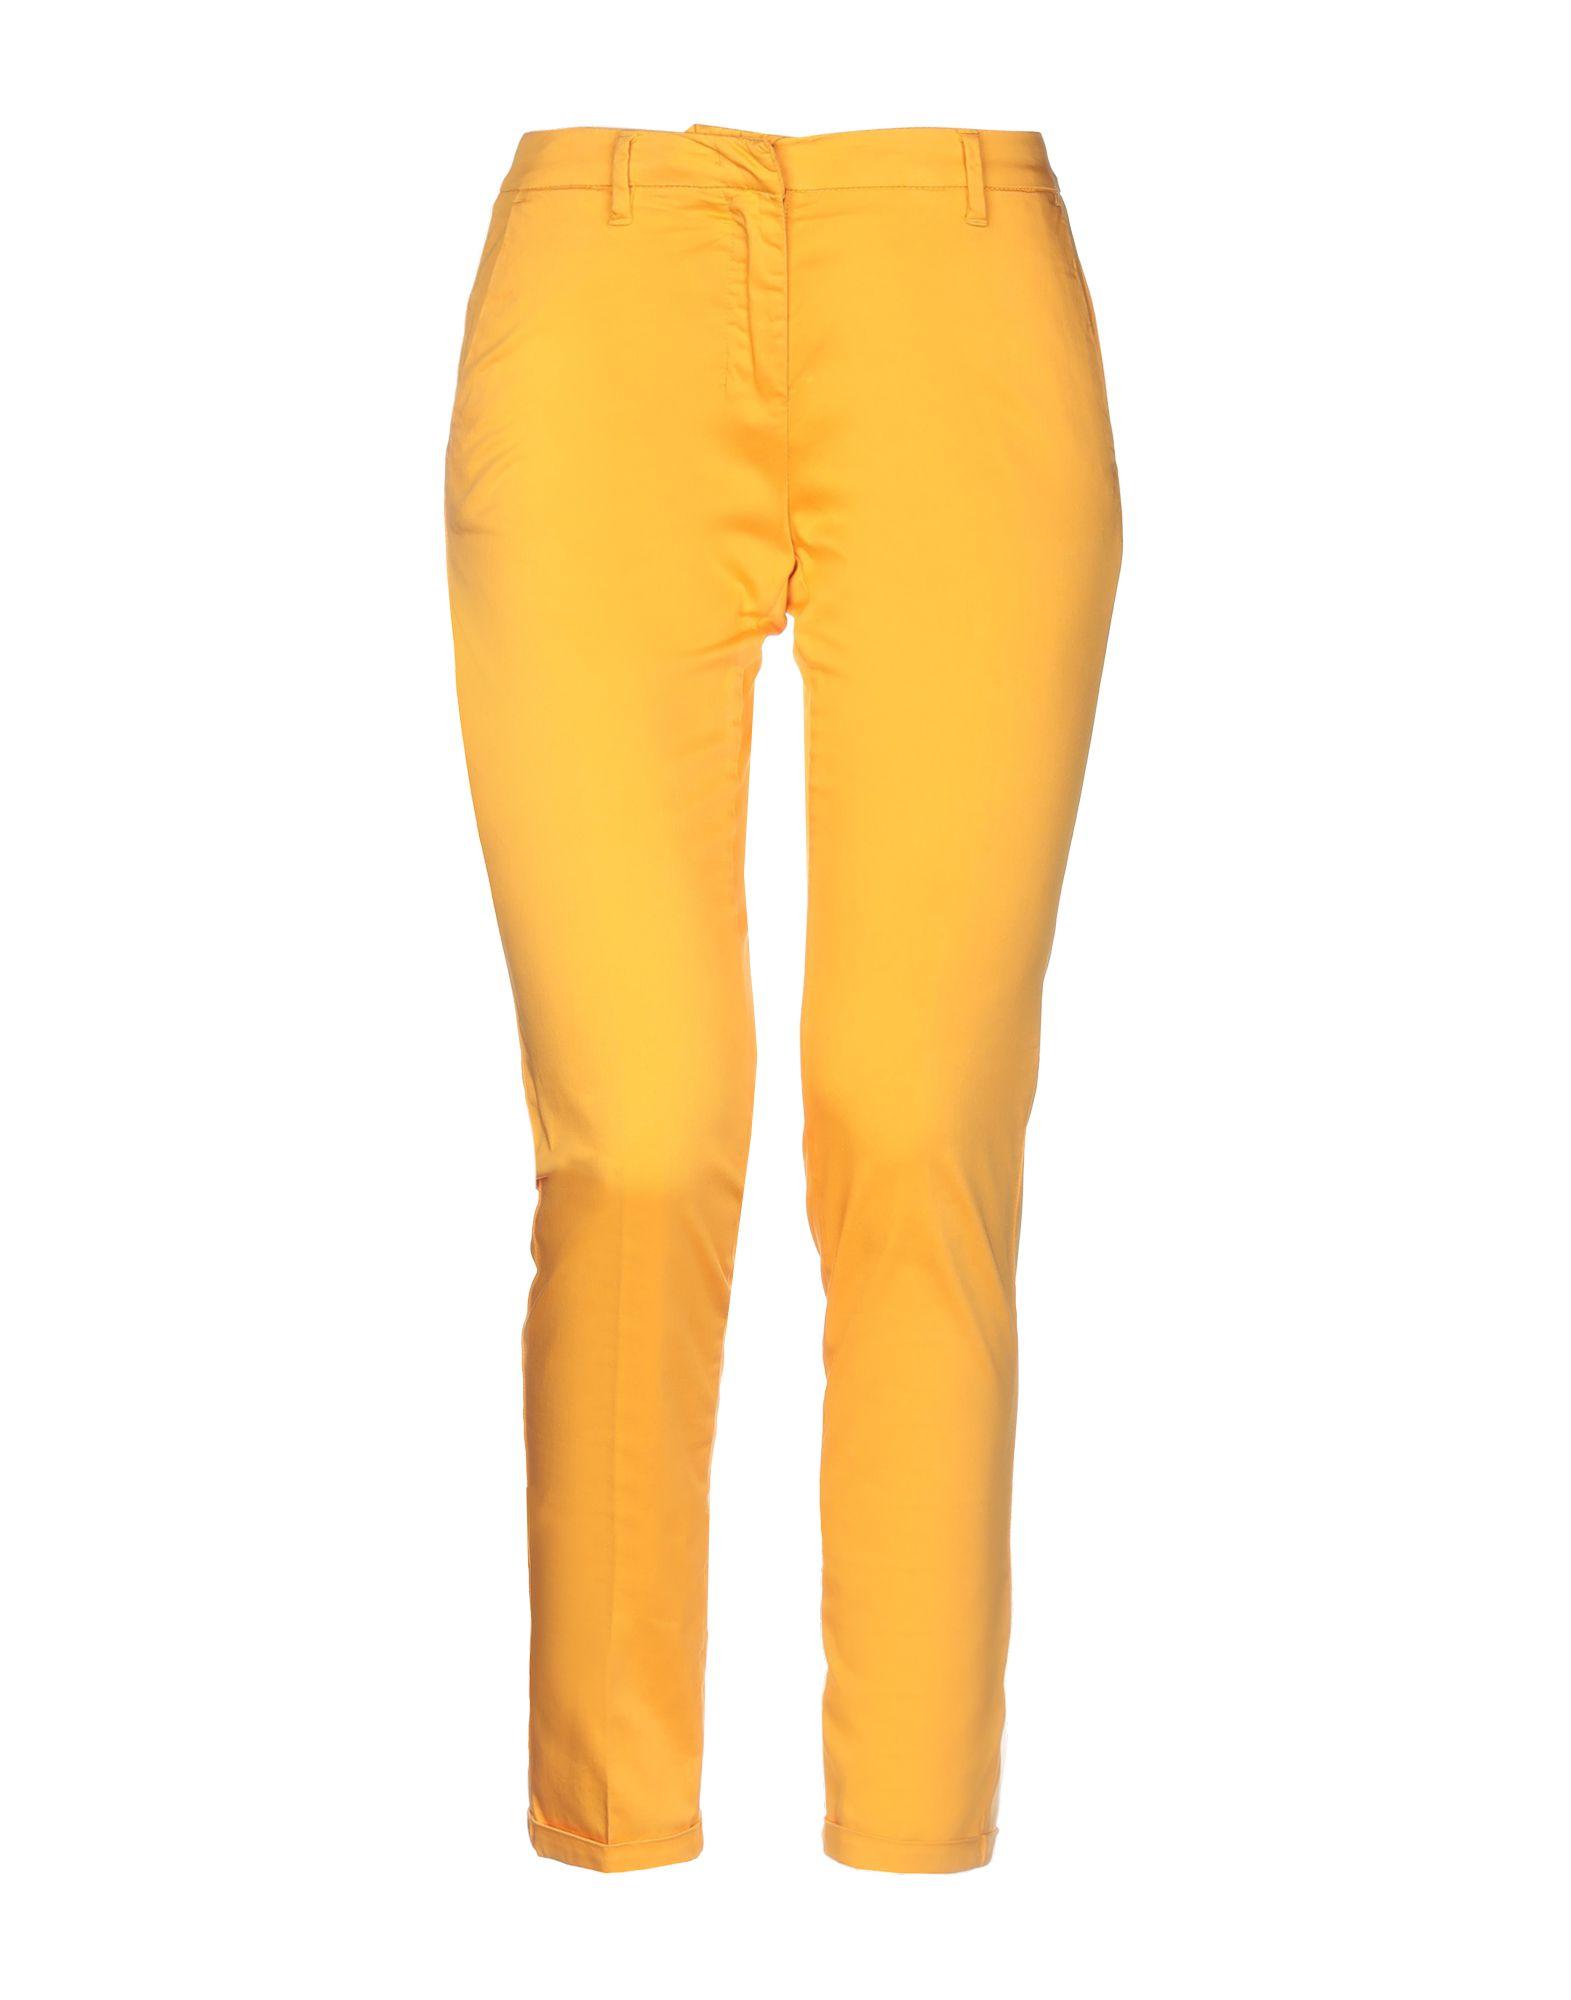 Pantalone At.P.Co donna - 36962326UM 36962326UM  billiger Verkauf